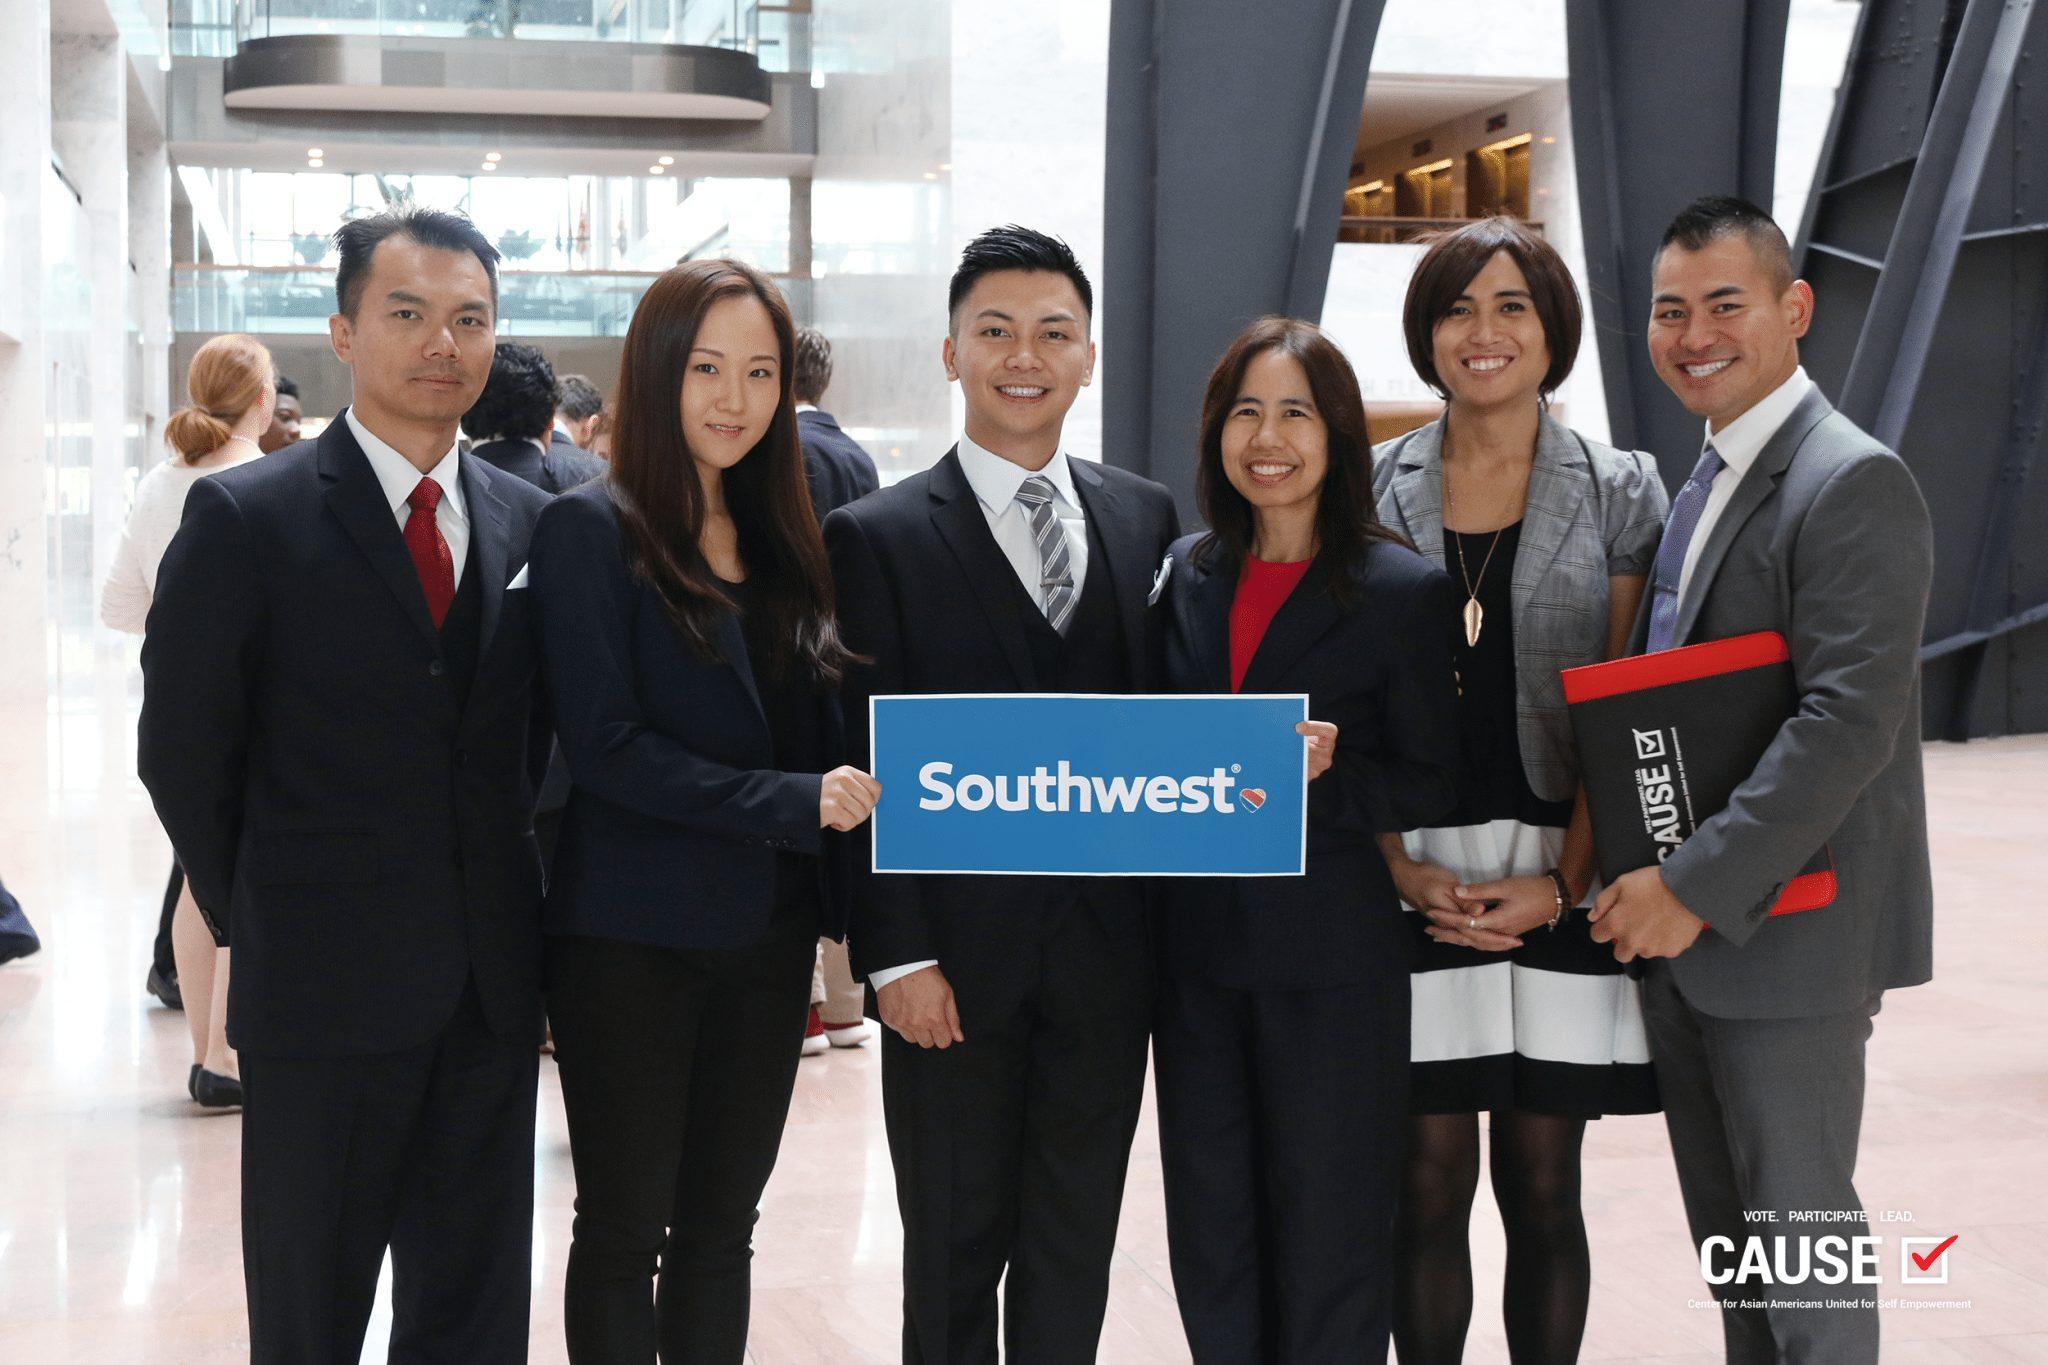 2017 Veterans Initiative fellows, Southwest